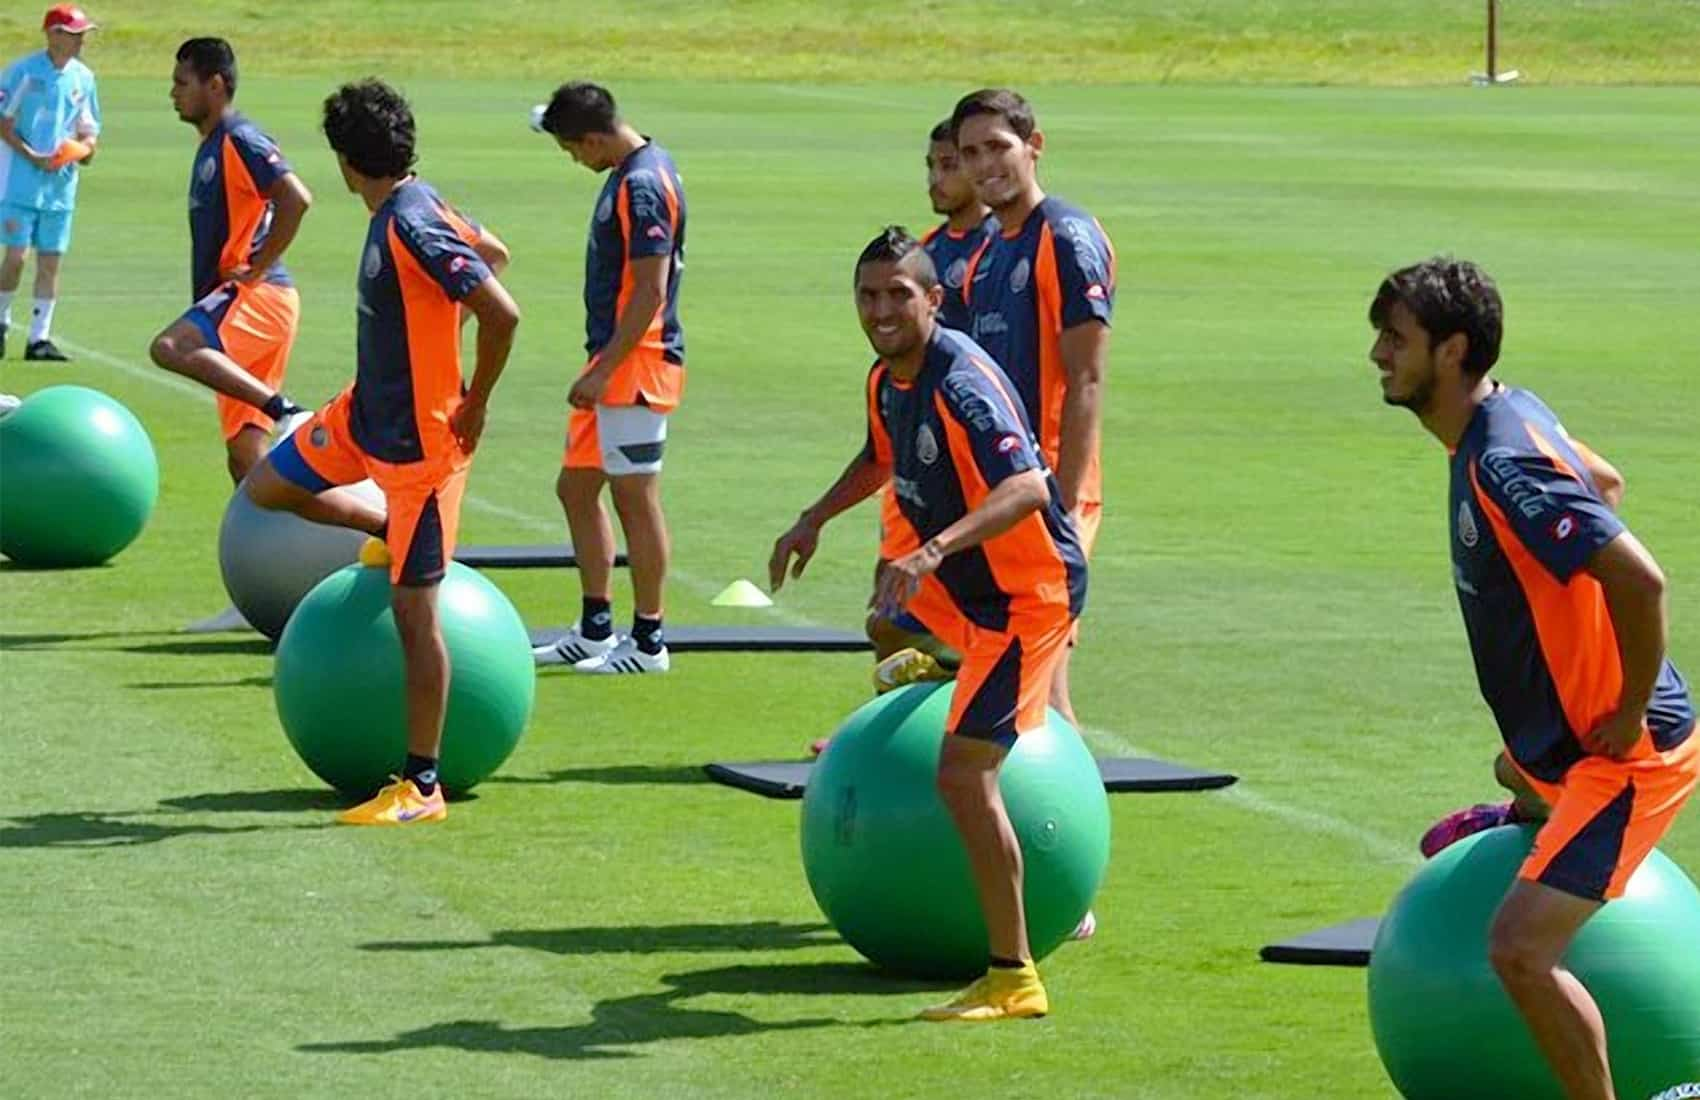 Costa Rica's National Team